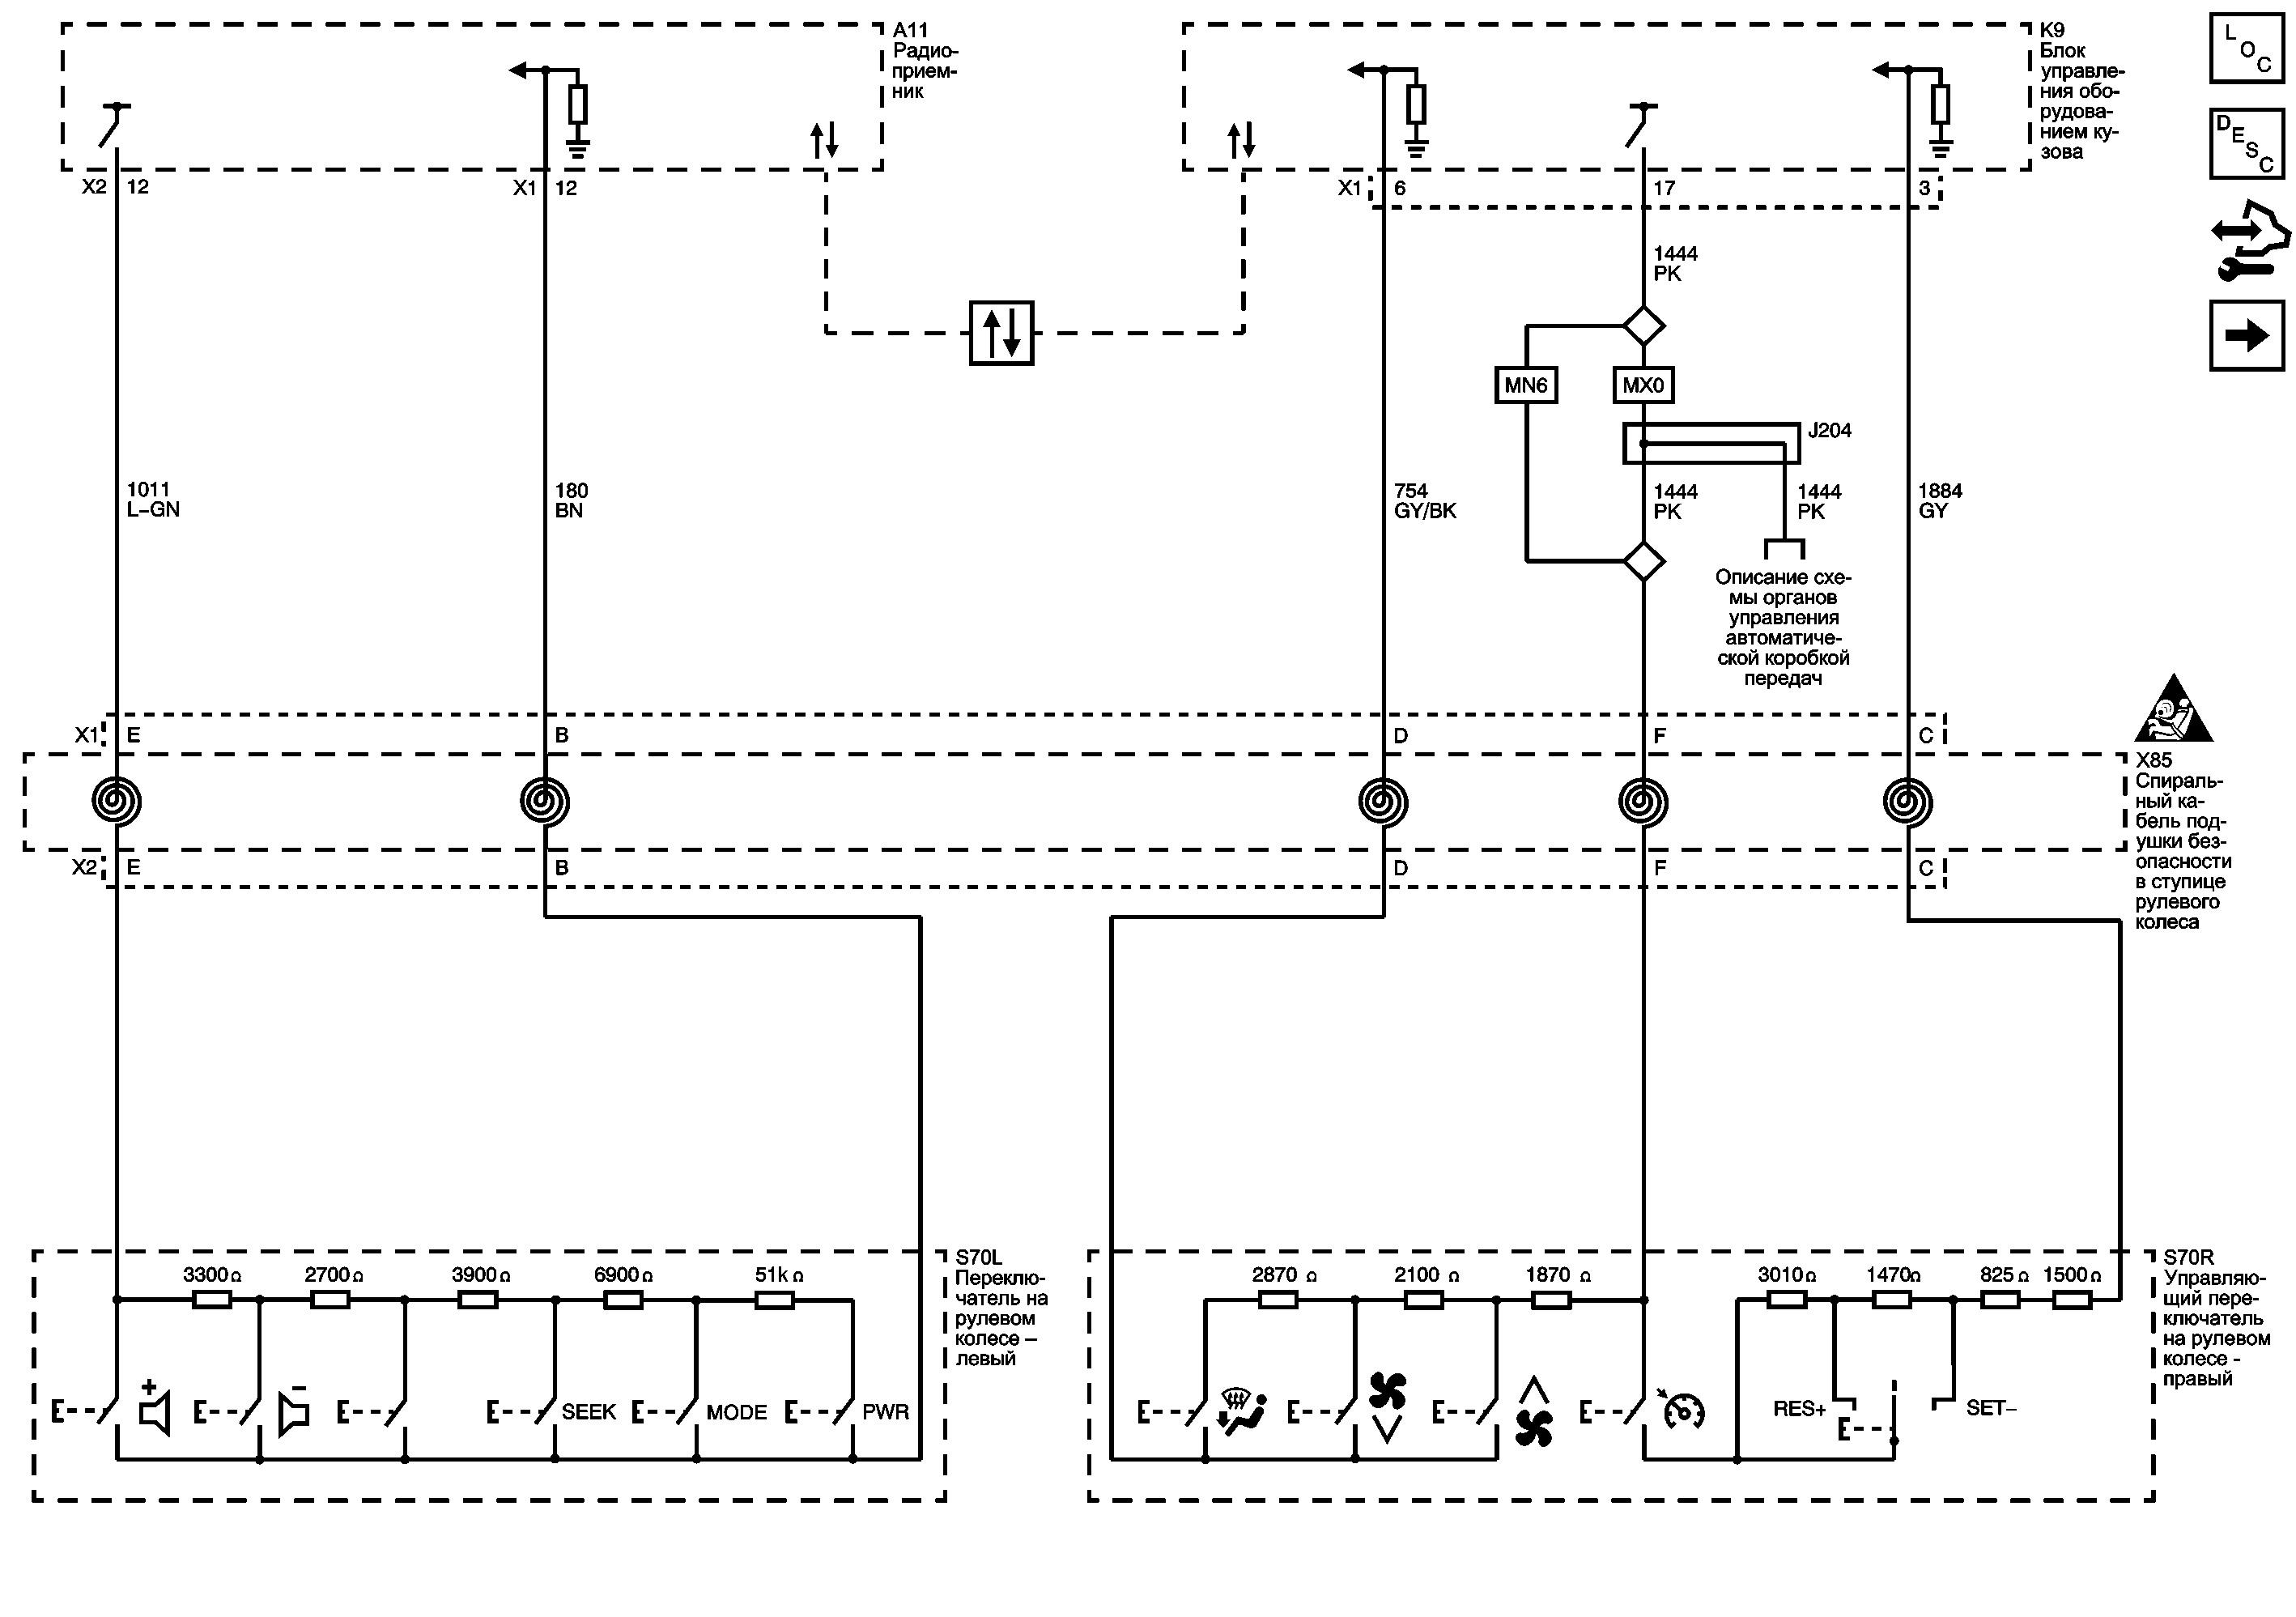 h схему автоматического включения фар в темноте